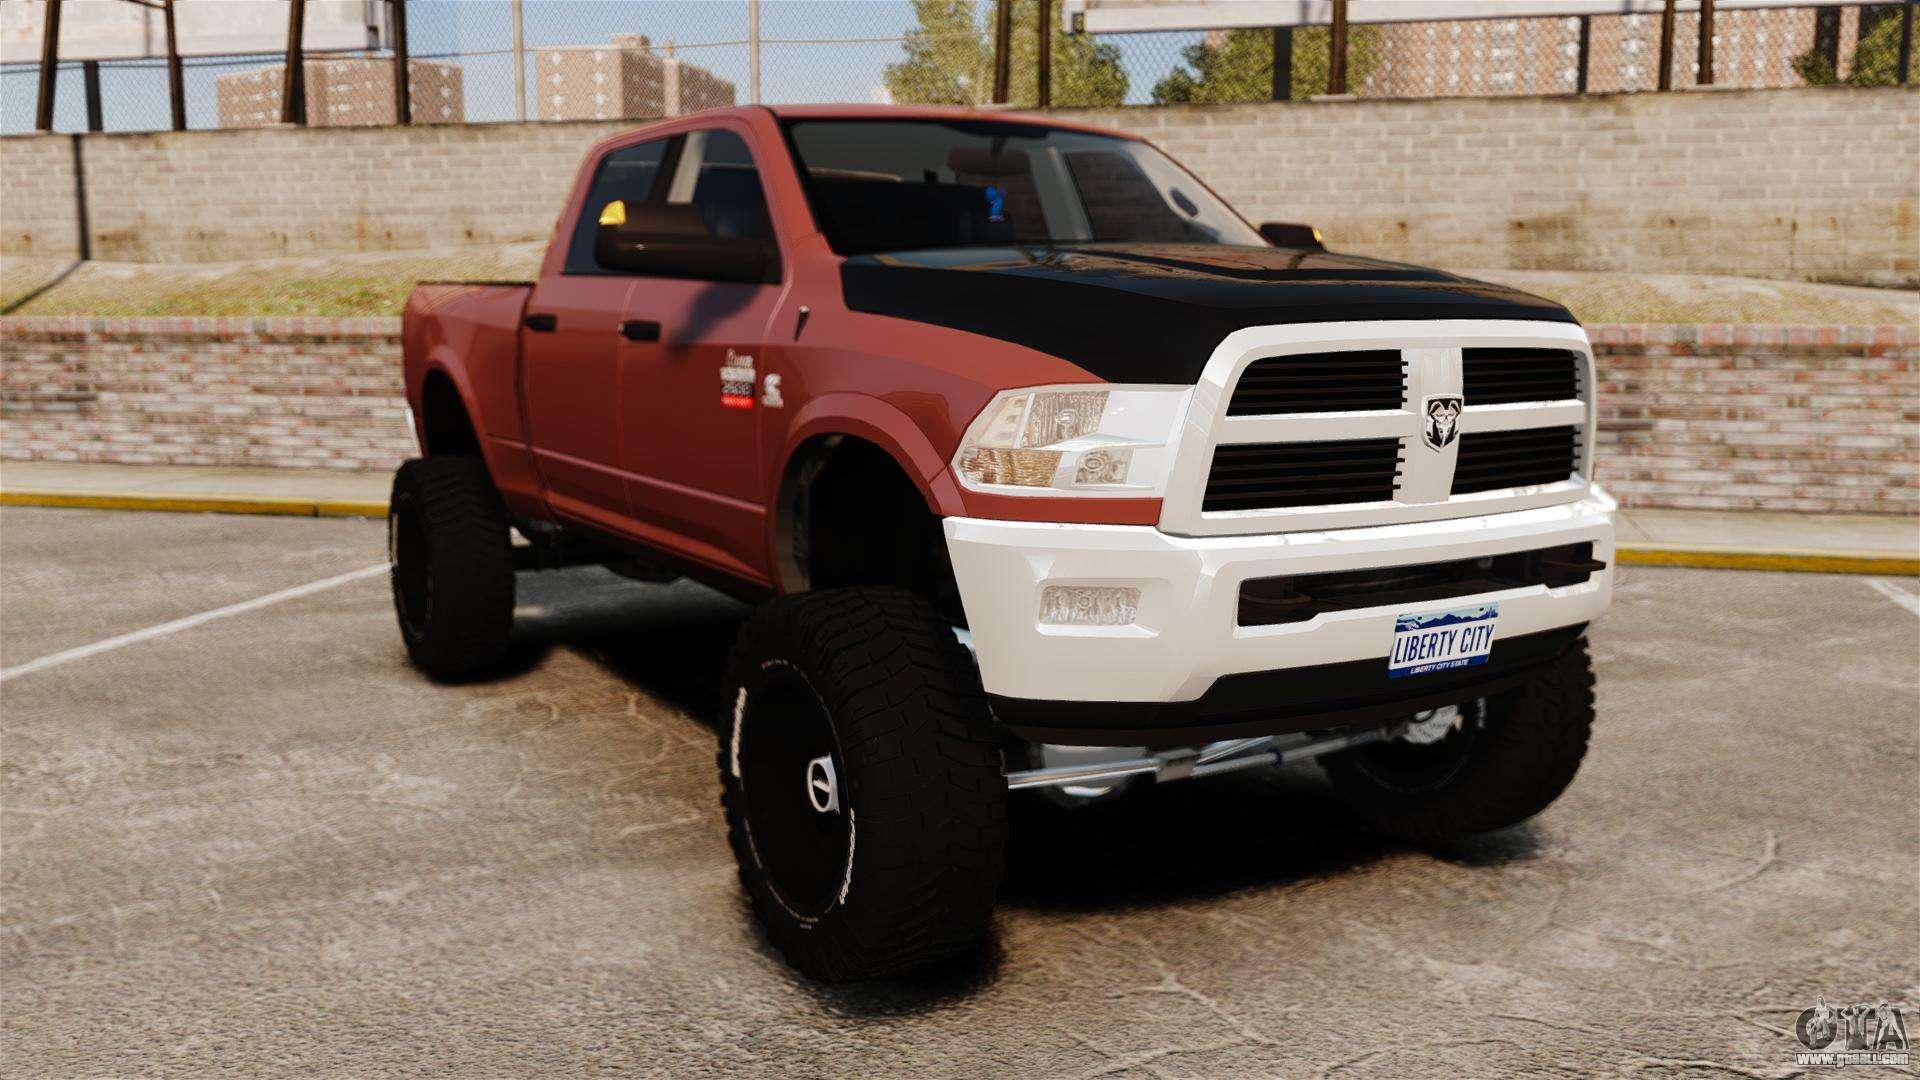 2013 Dodge Ram 2500 Lifted Dodge ram 2500 lifted edition